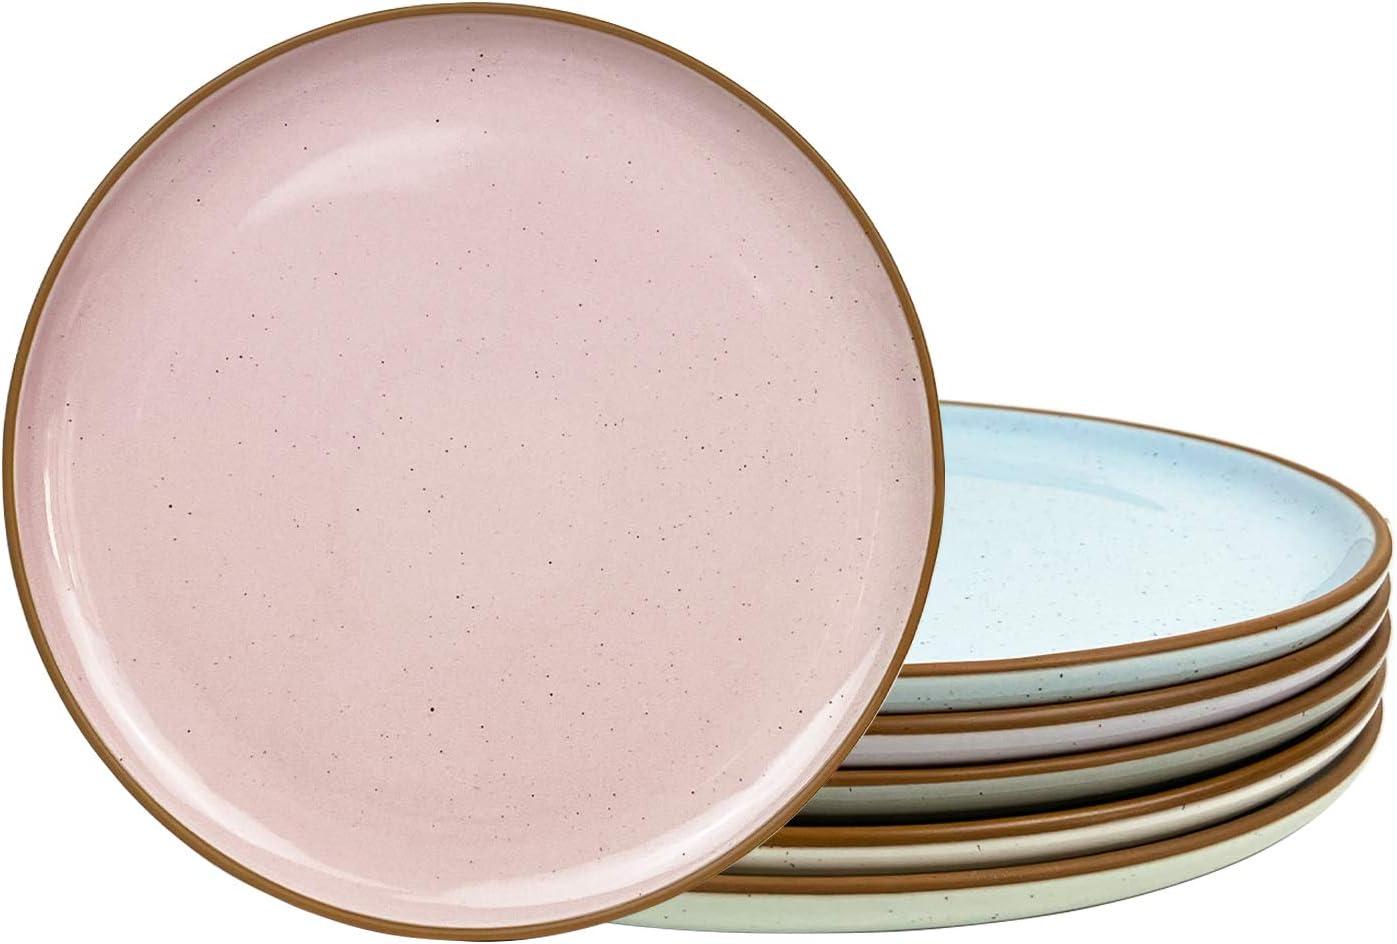 Quality inspection Mora Ceramic Dinner Plates Set of 6 Popular popular Microwav Dish inch 10 -